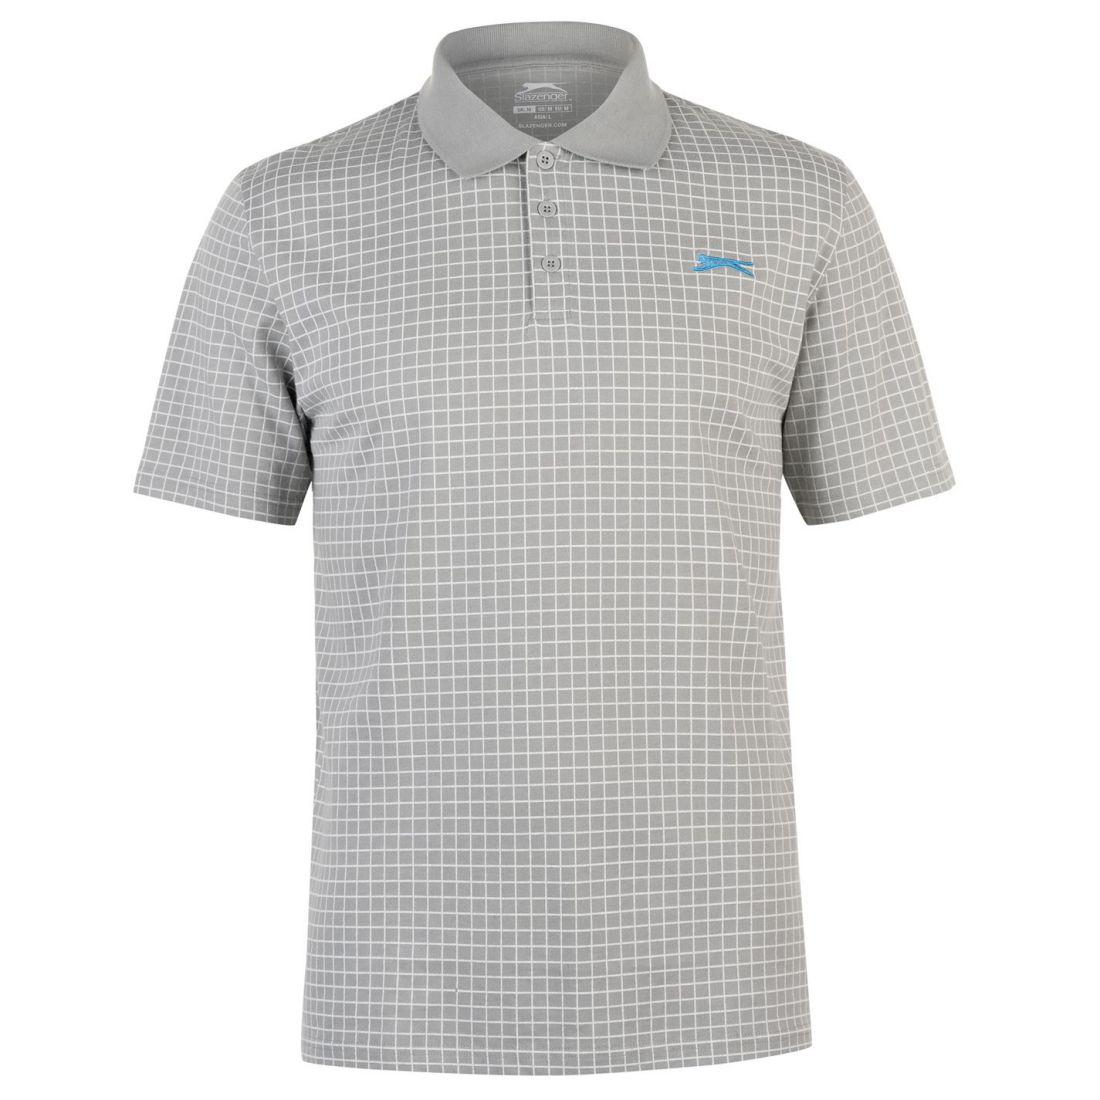 c46035b7 Slazenger Mens Check Golf Polo Short Sleeve Performance Shirt Tee ...